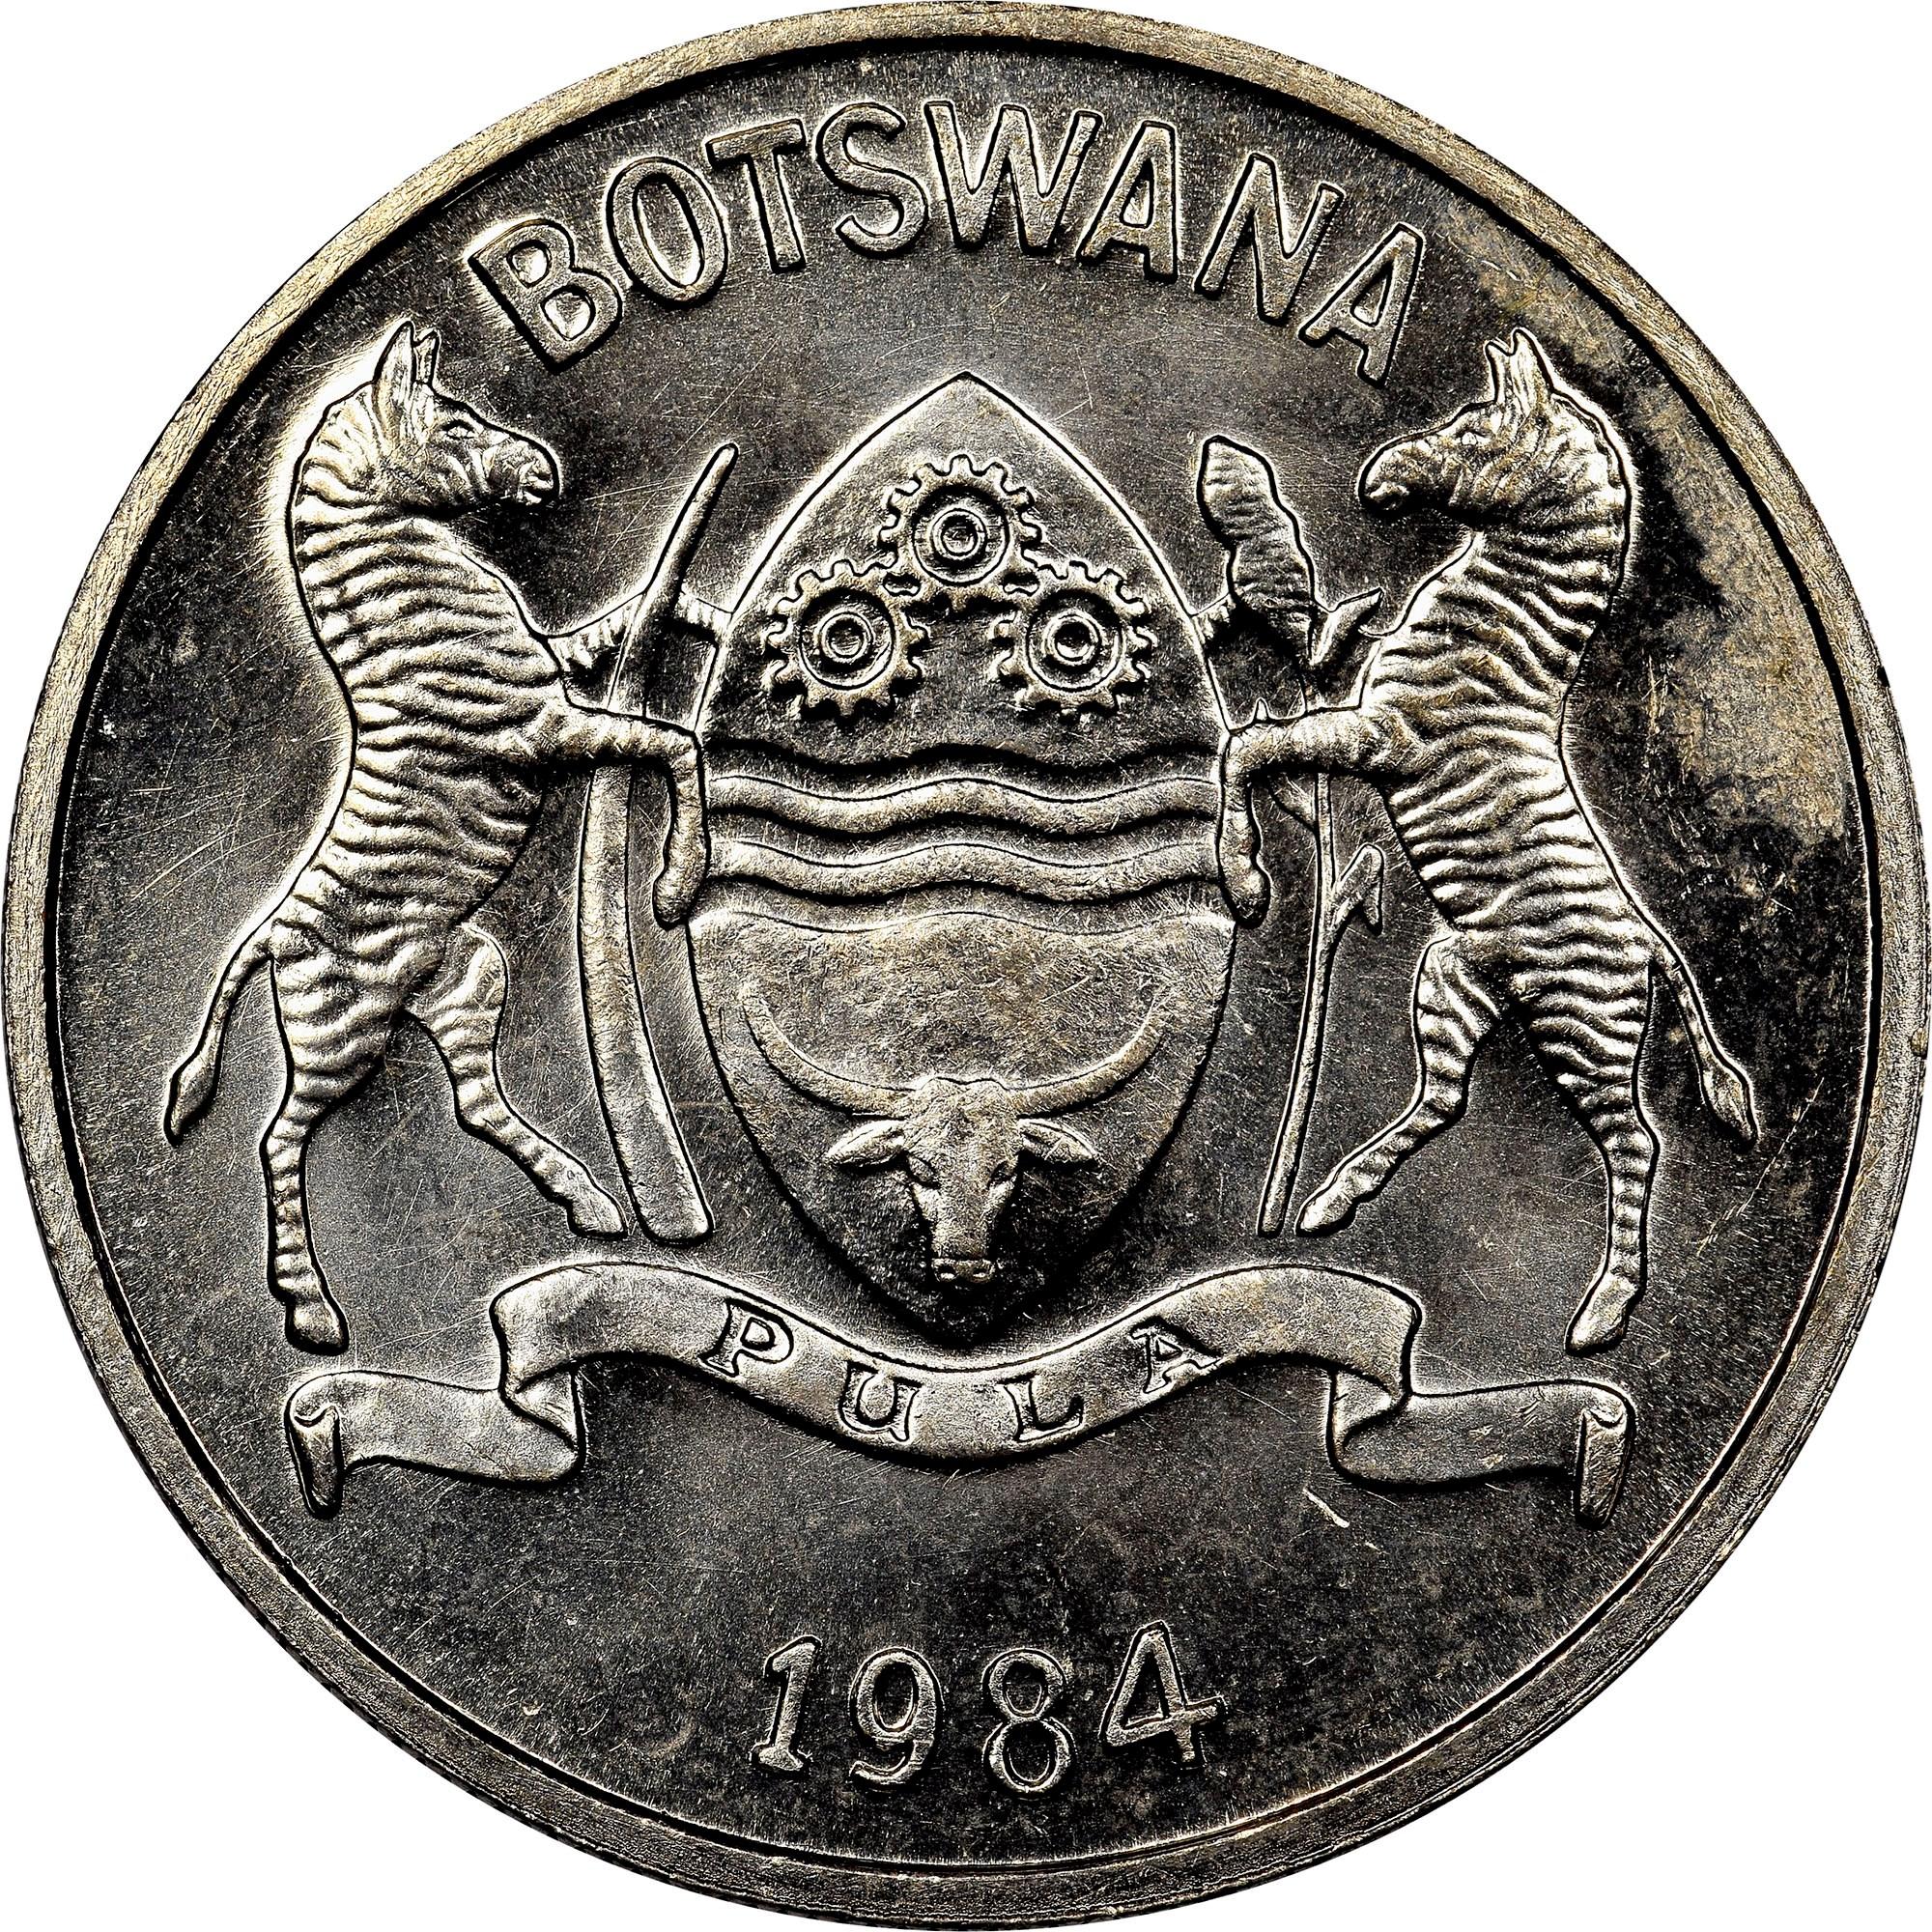 Botswana 25 Thebe obverse